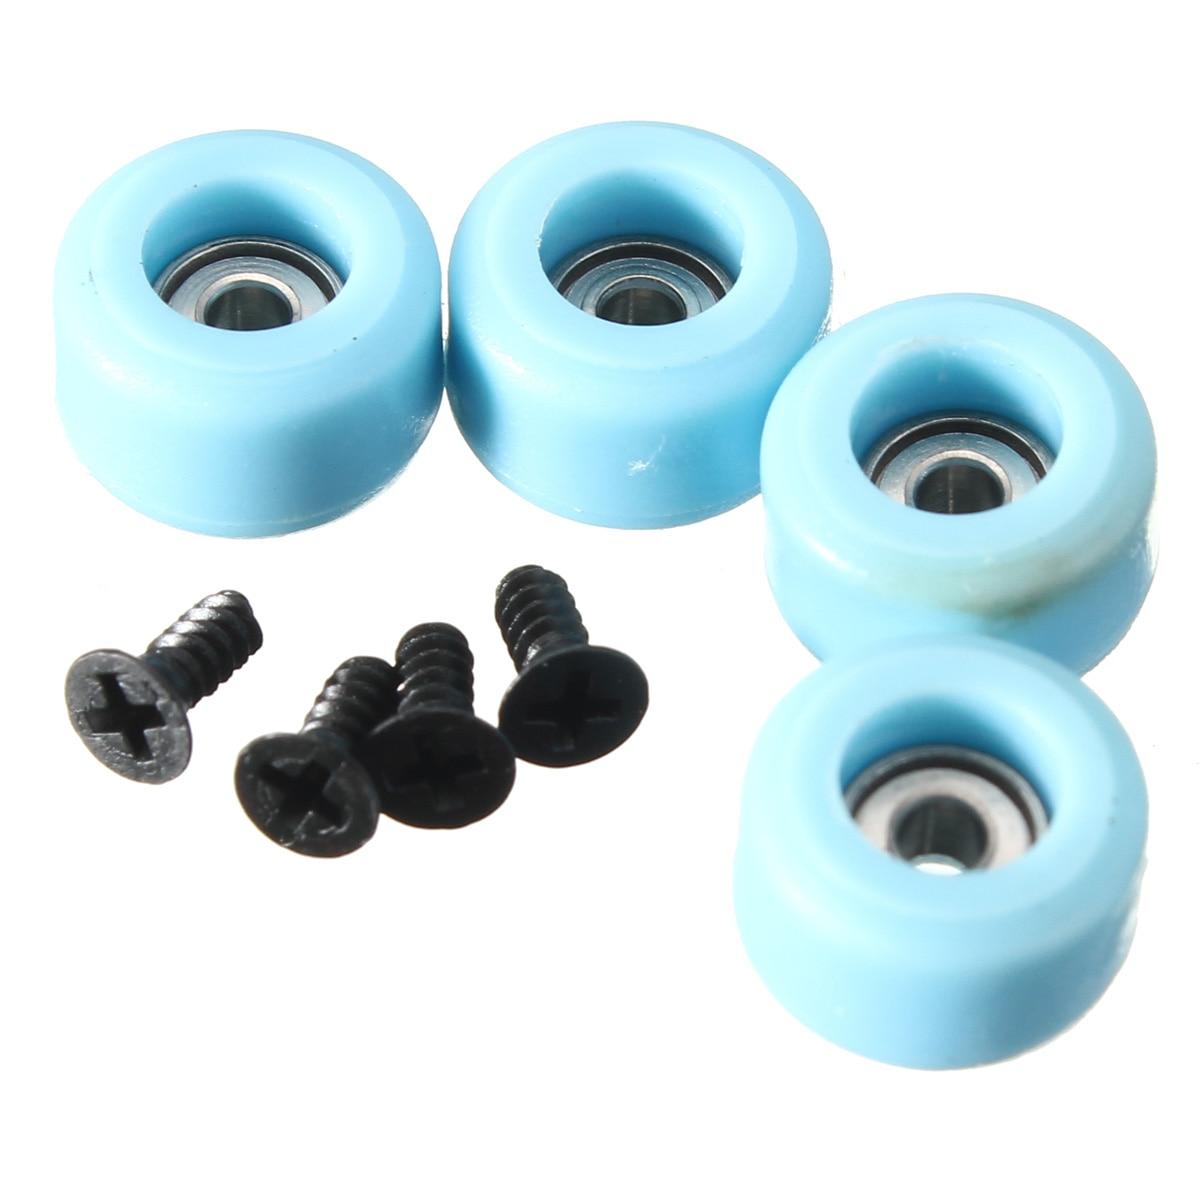 JIMITU 4 Pcs/Set Professional Urethane CNC Bearing Wheels For Wooden Fingerboard